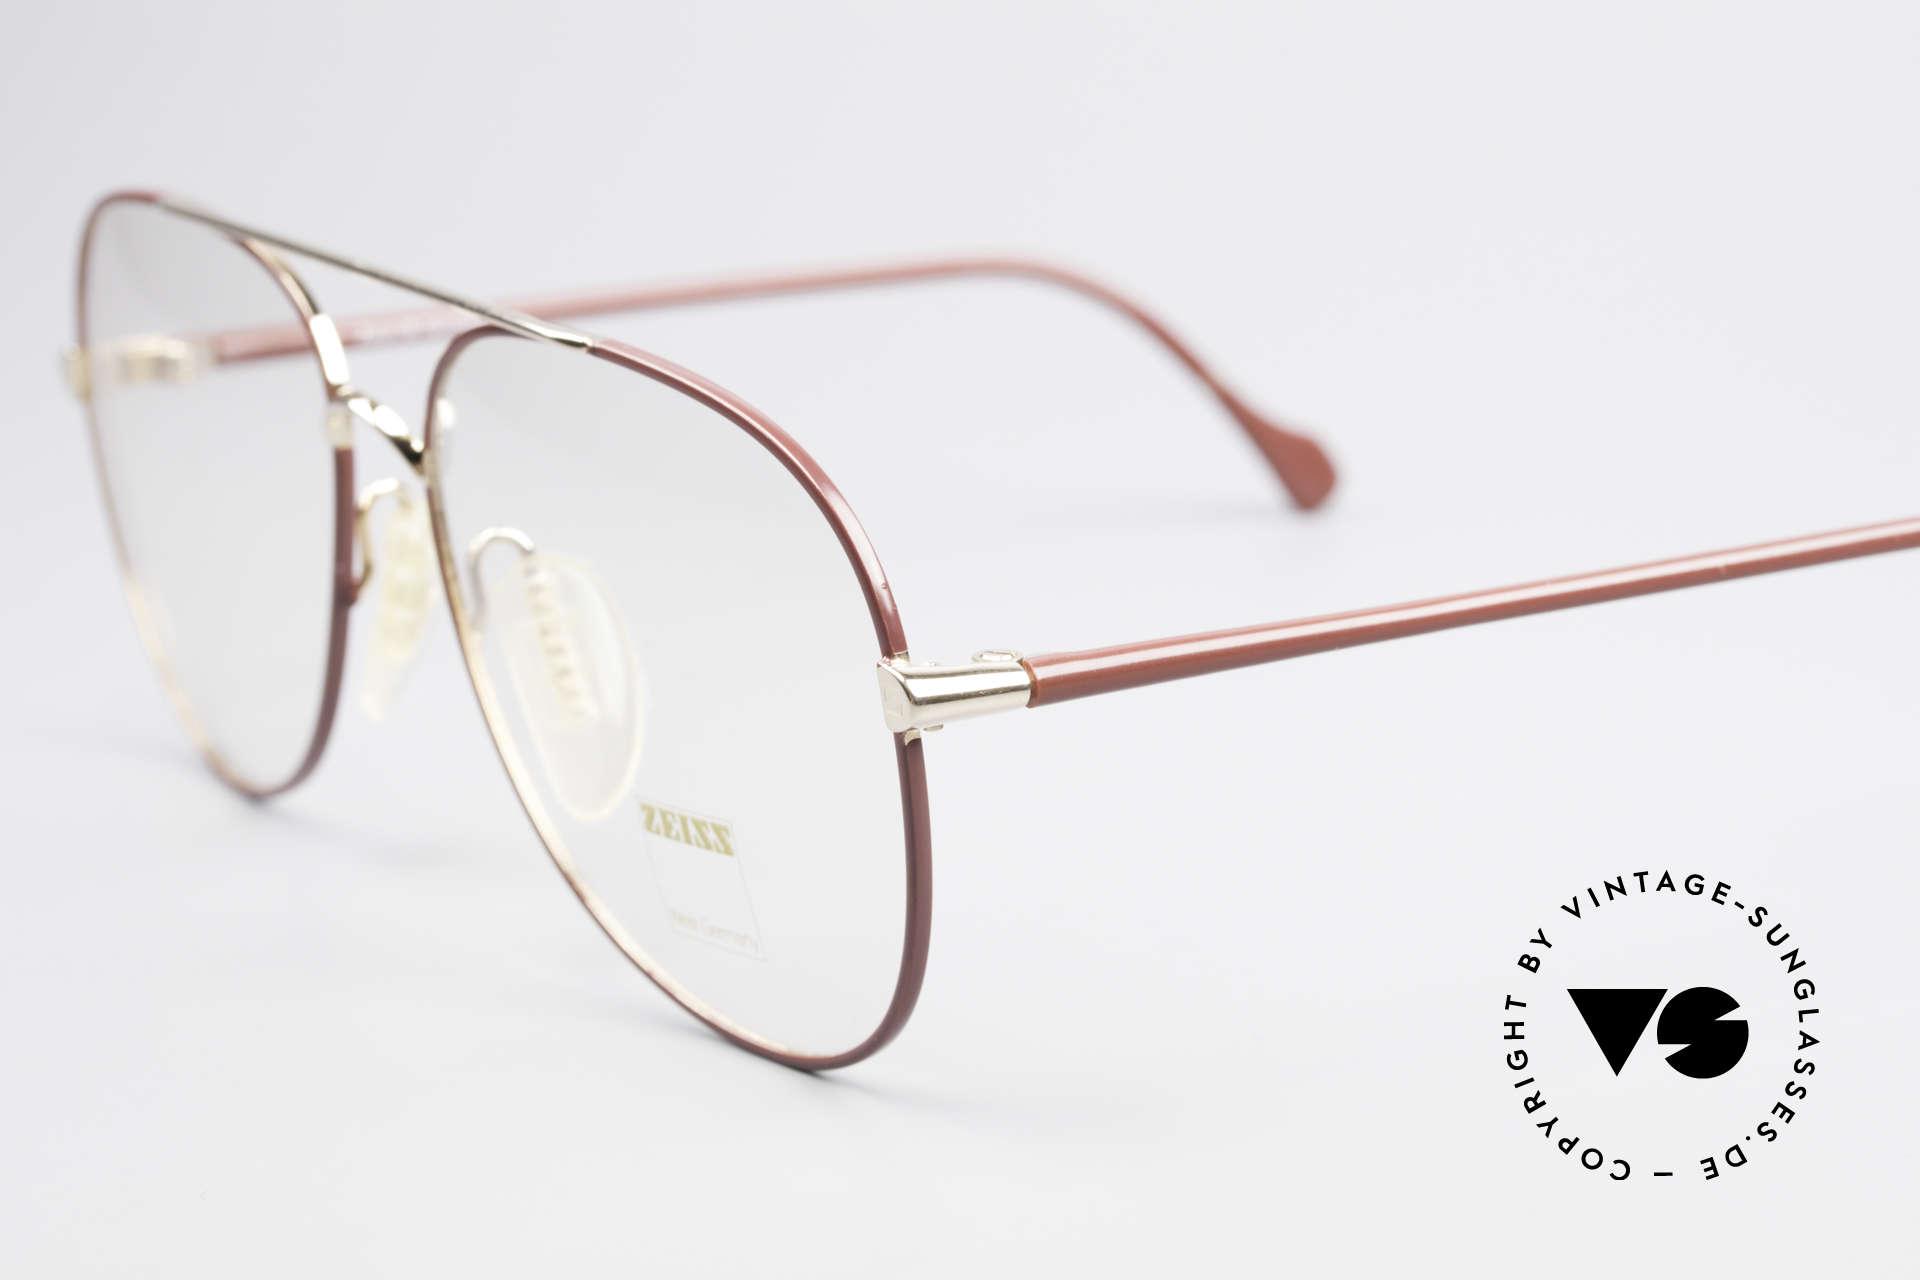 Zeiss 5882 Old 80's Eyeglass-Frame Men, unworn (like all our high-end Zeiss vintage eyewear), Made for Men